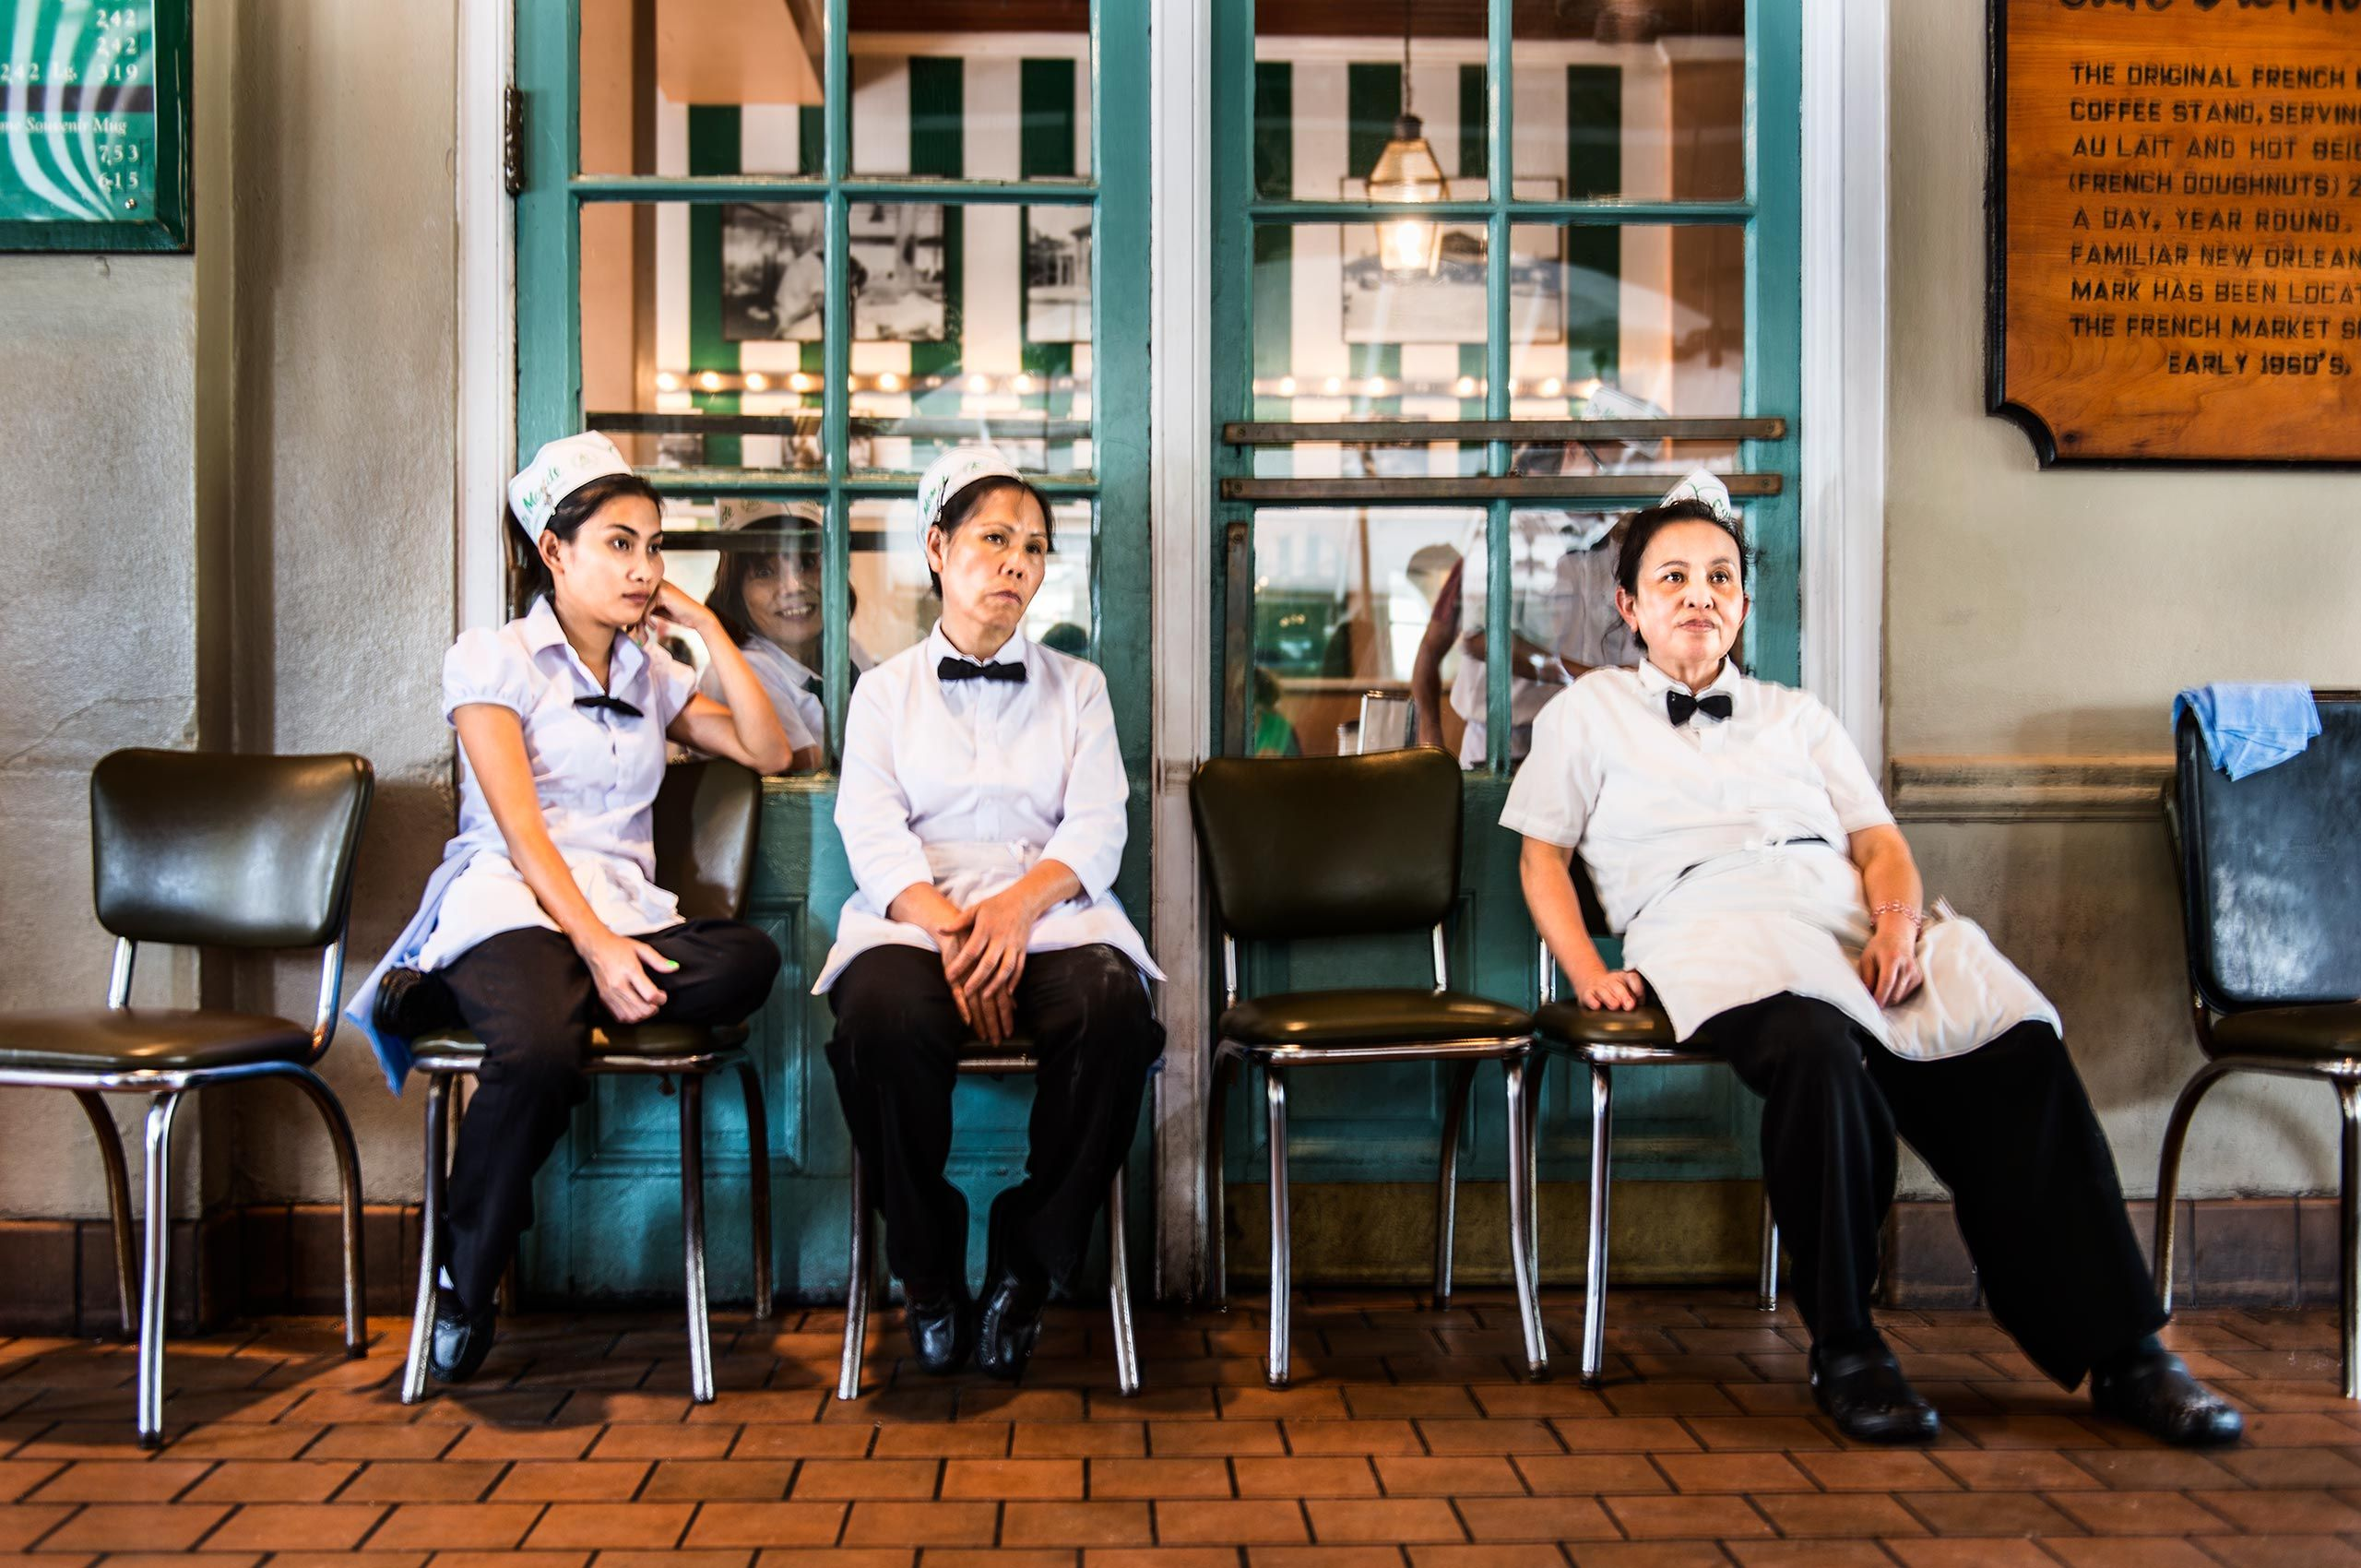 cafe-du-monde-waitresses-HenrikOlundPhotography.jpg